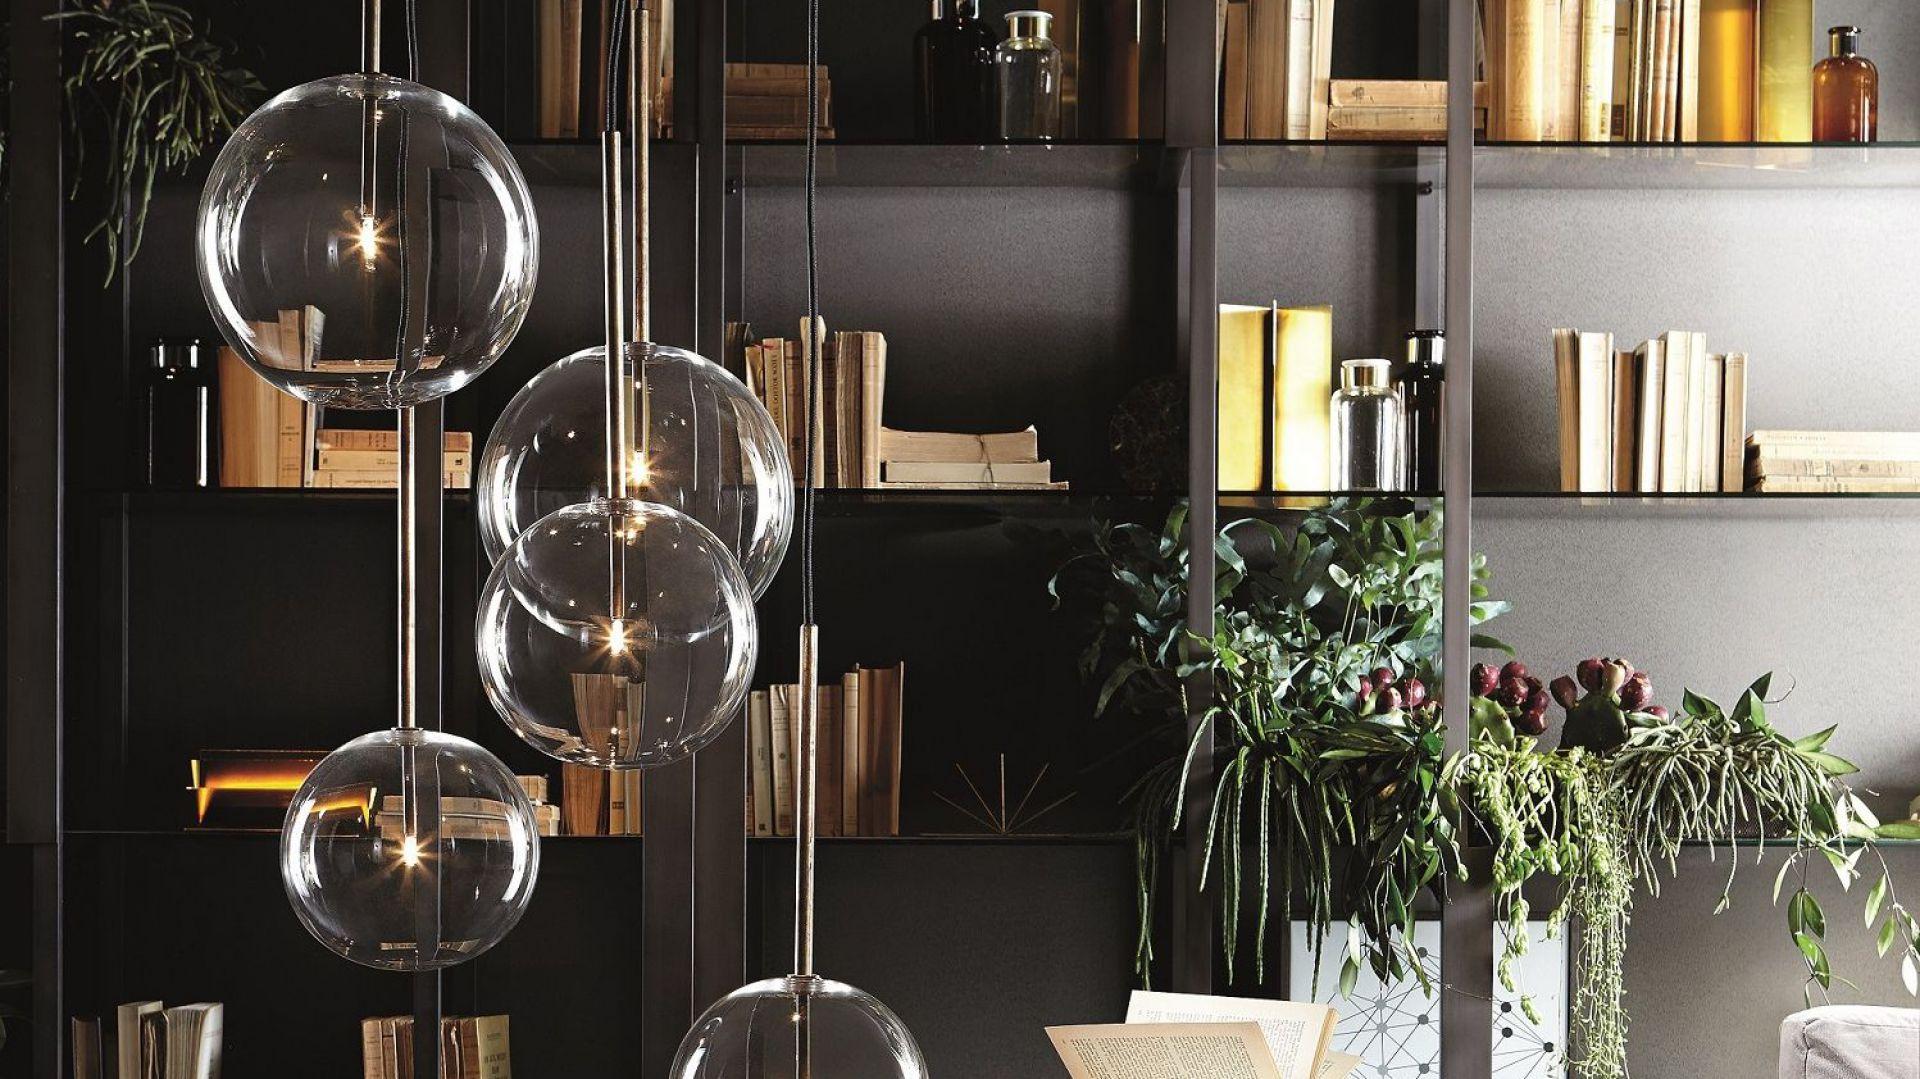 Lampy z kolekcji Bolle. Projekt: Gallotti & Radice. Fot. Gallotti & Radice / Atelier Mesmetric